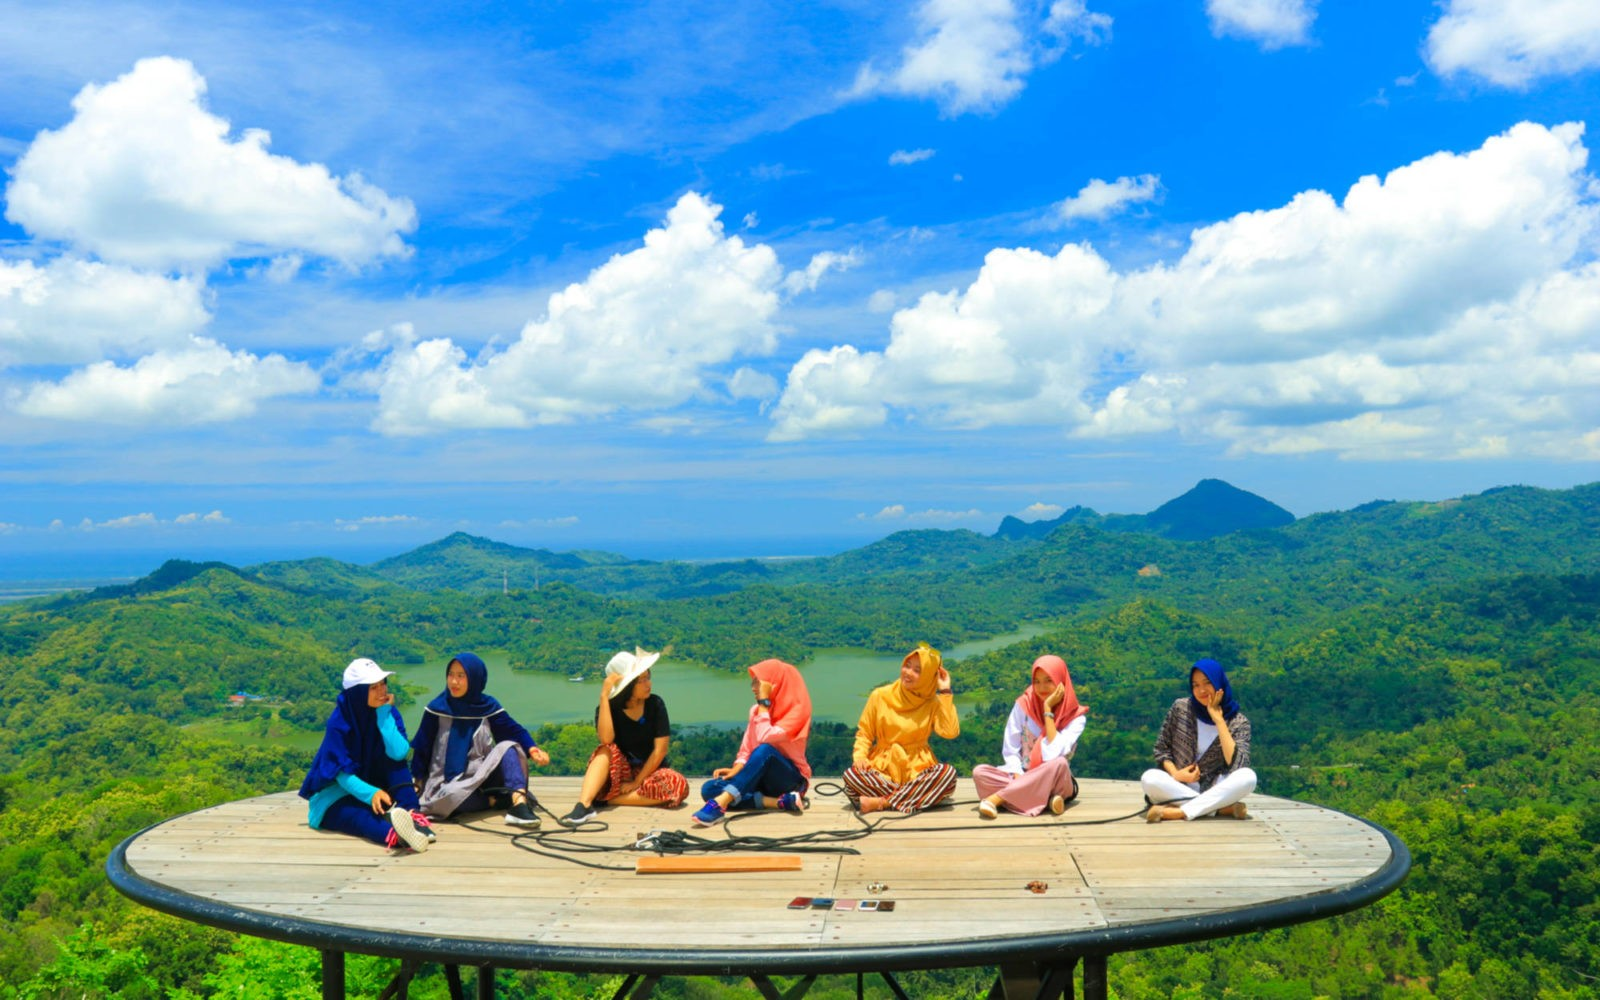 Wisata Kalibiru Jogja Tiket Pesona Alam April 2021 Travelspromo